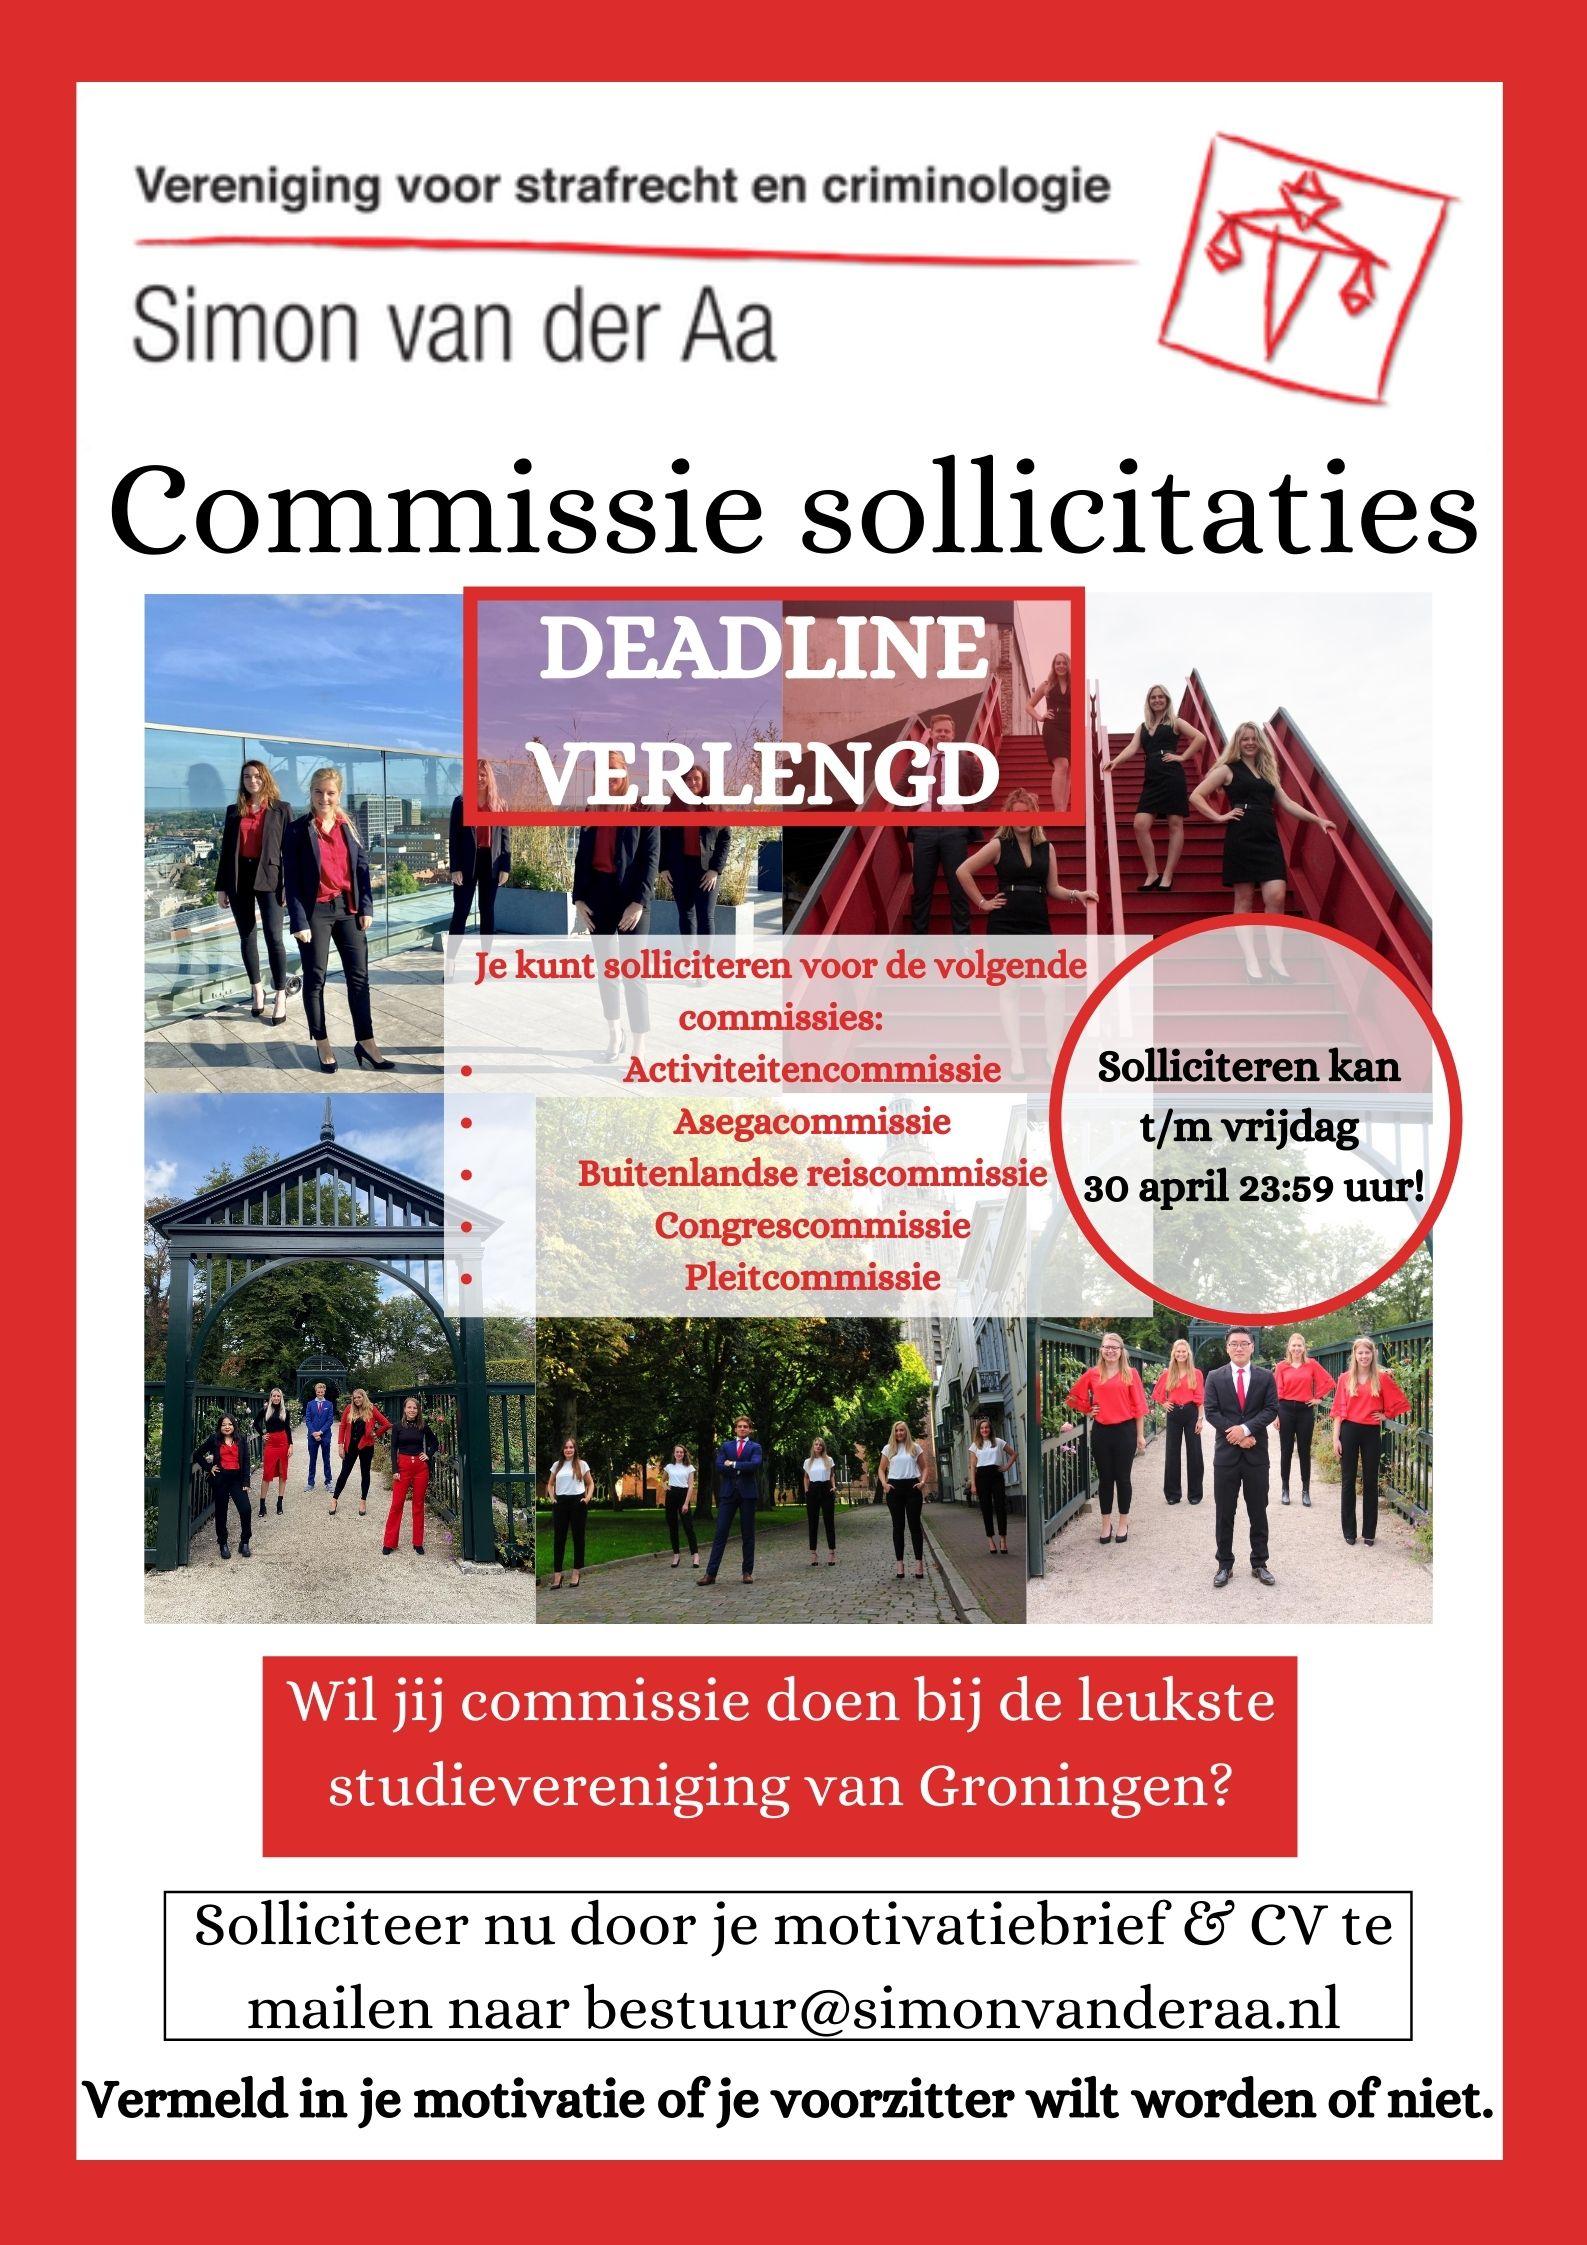 Deadline_verlengdCommissie_sollis_definitieve_versie.jpg